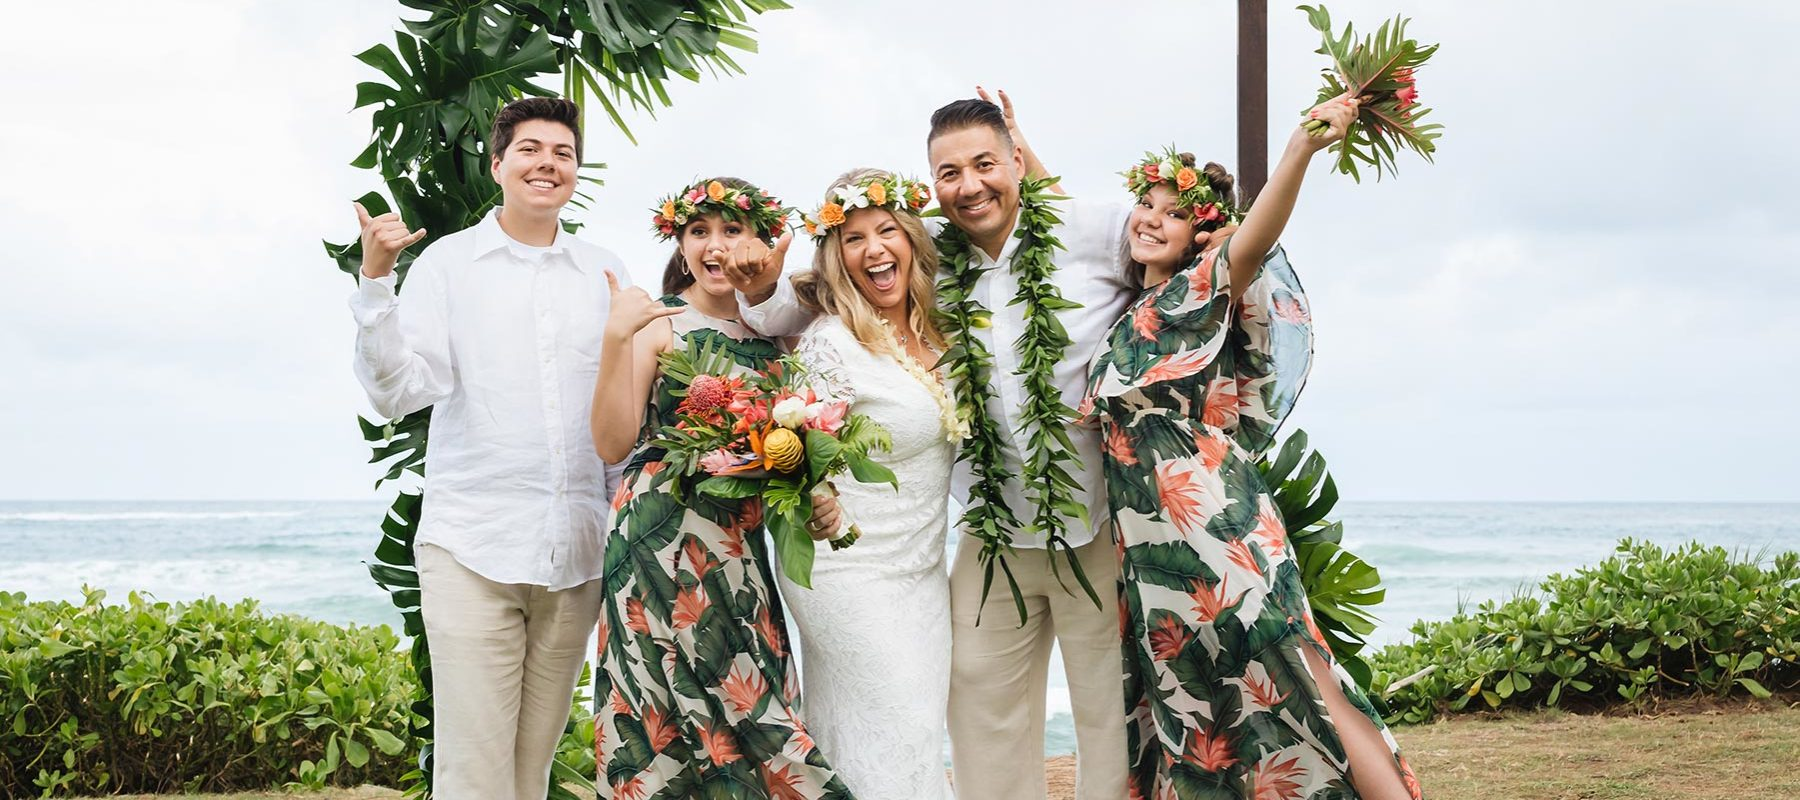 Family celebrating vow renewal on Kauai with arch way and haku leis.